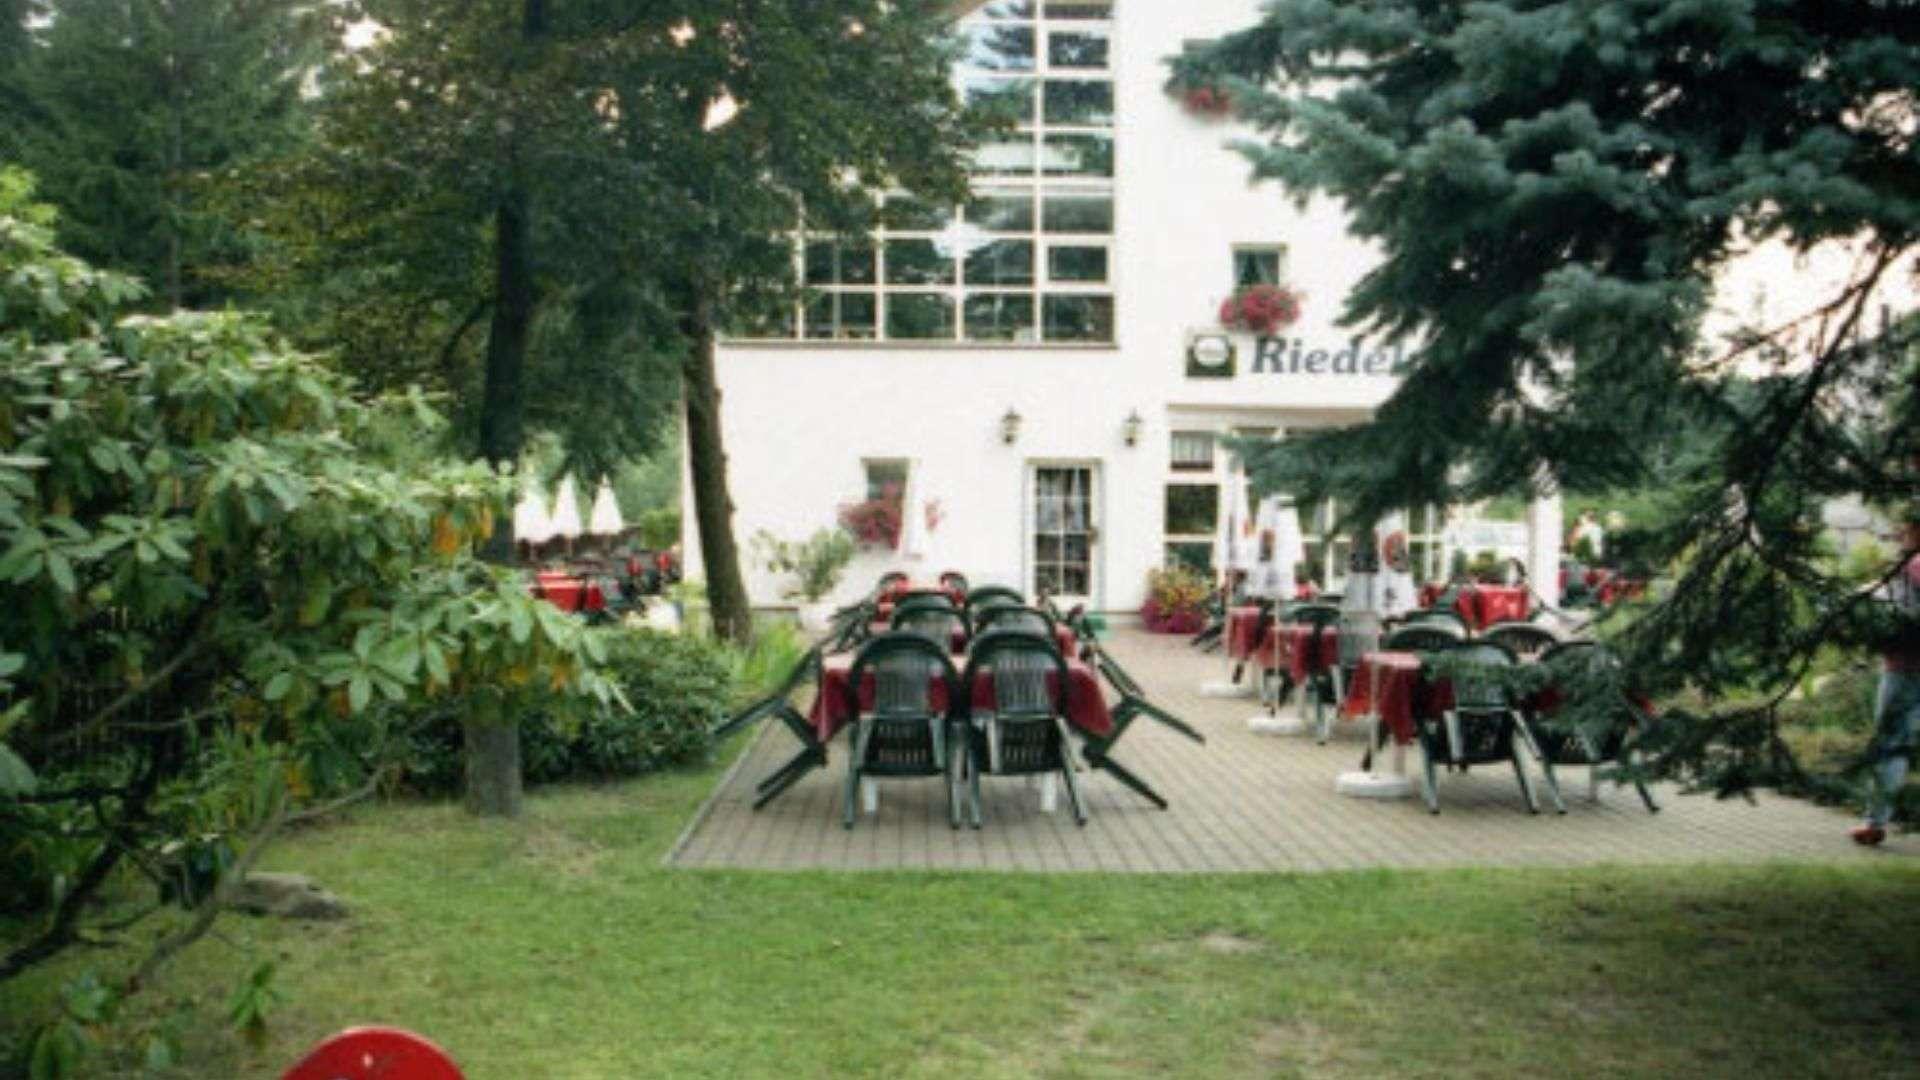 Referenzen - Gaststätten-Pavillon